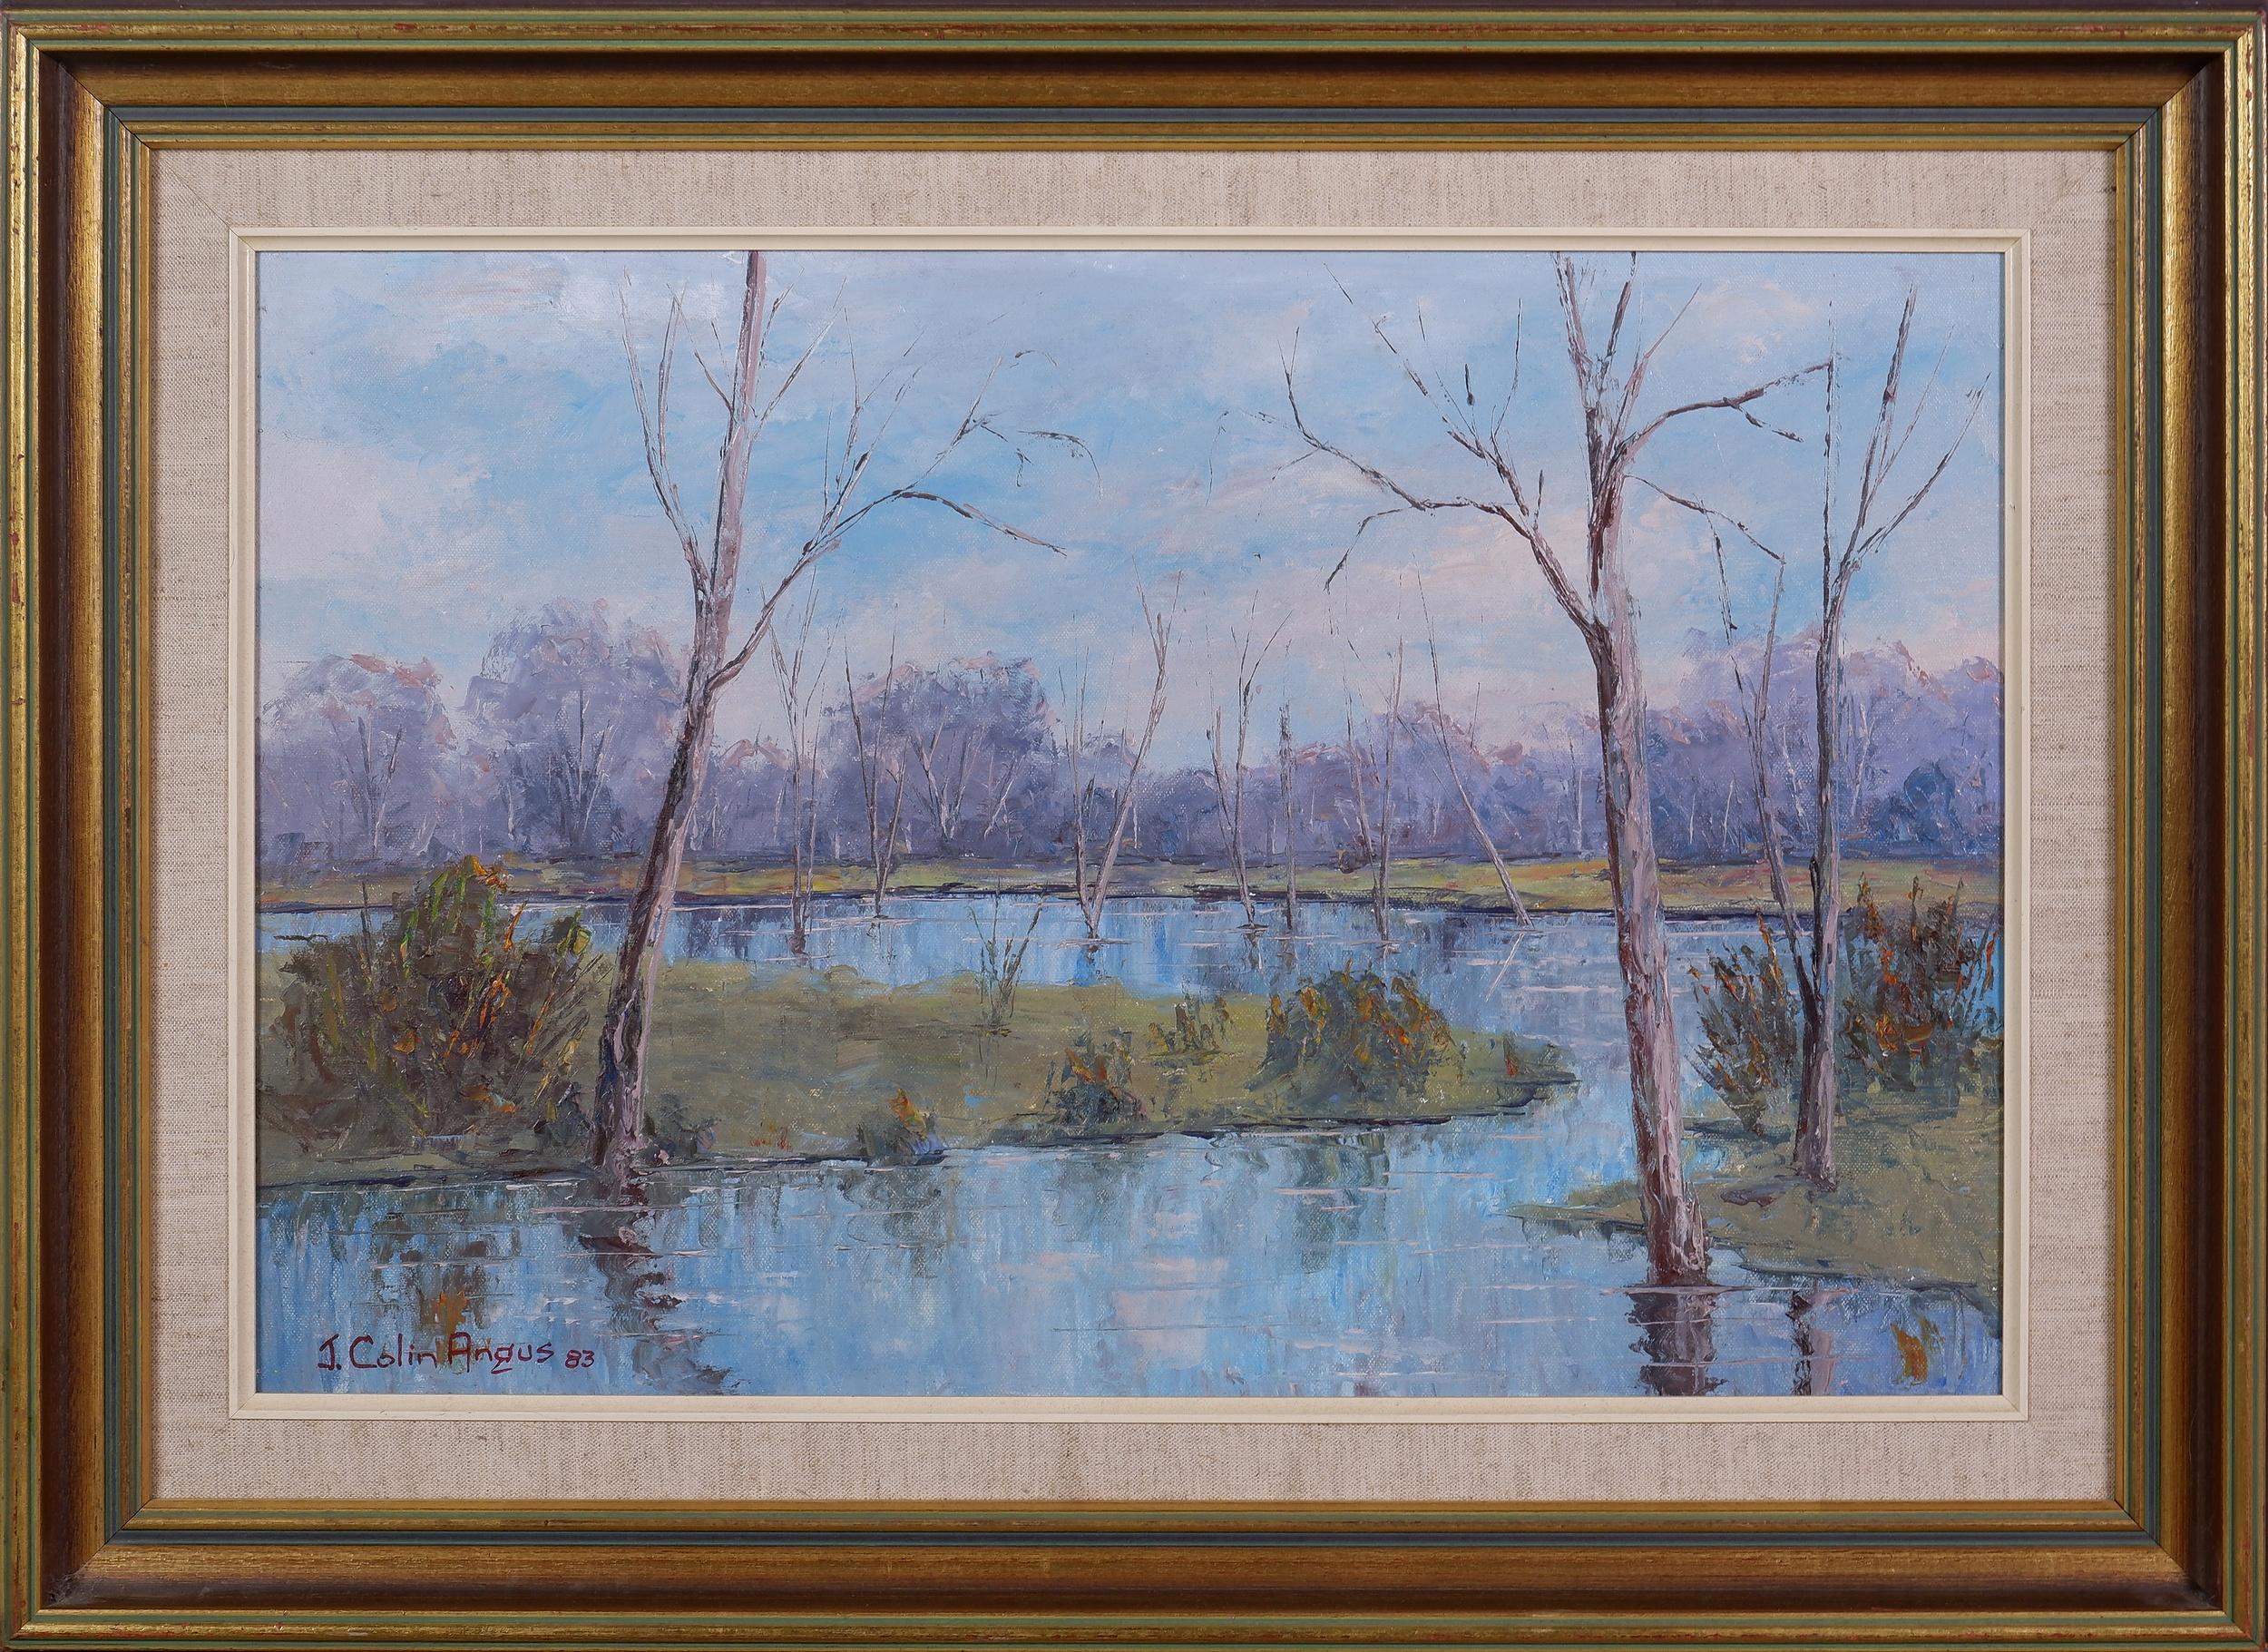 'J. Colin Angus (1907-2002), Lake Mulwala Backwaters 1983, Oil on Canvas on Board'